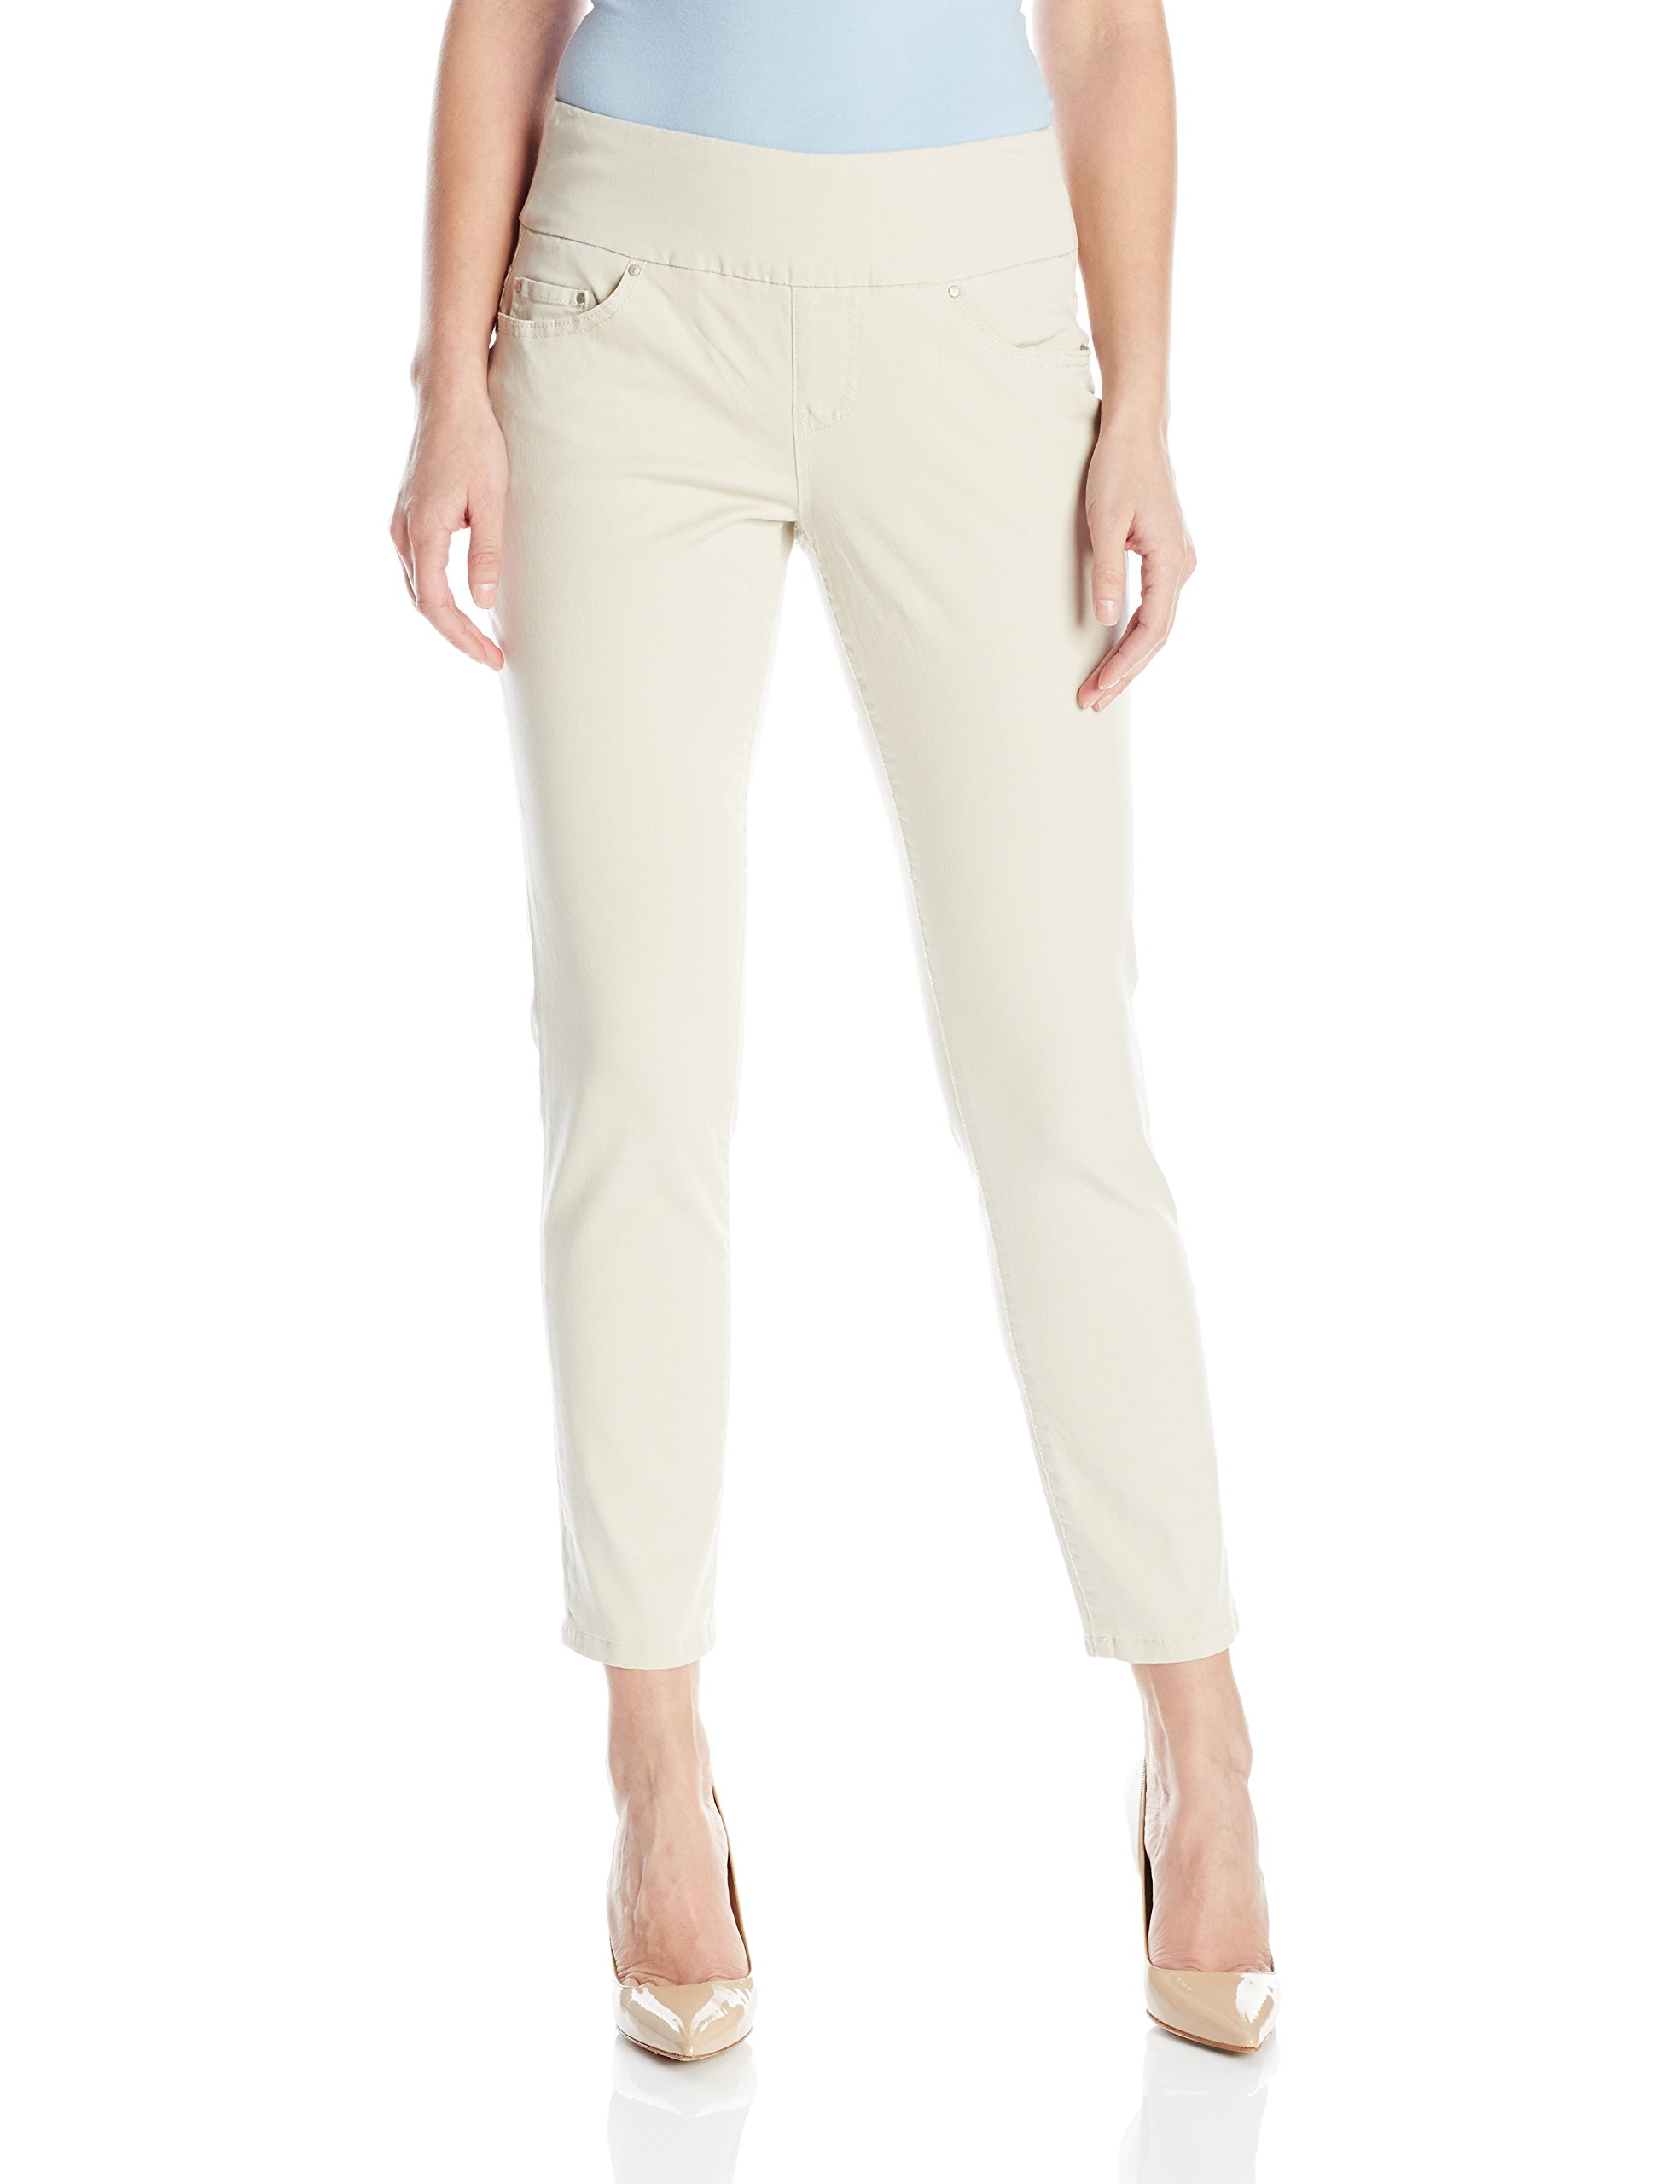 Jag Jeans Women's Amelia Slim Ankle Pull on